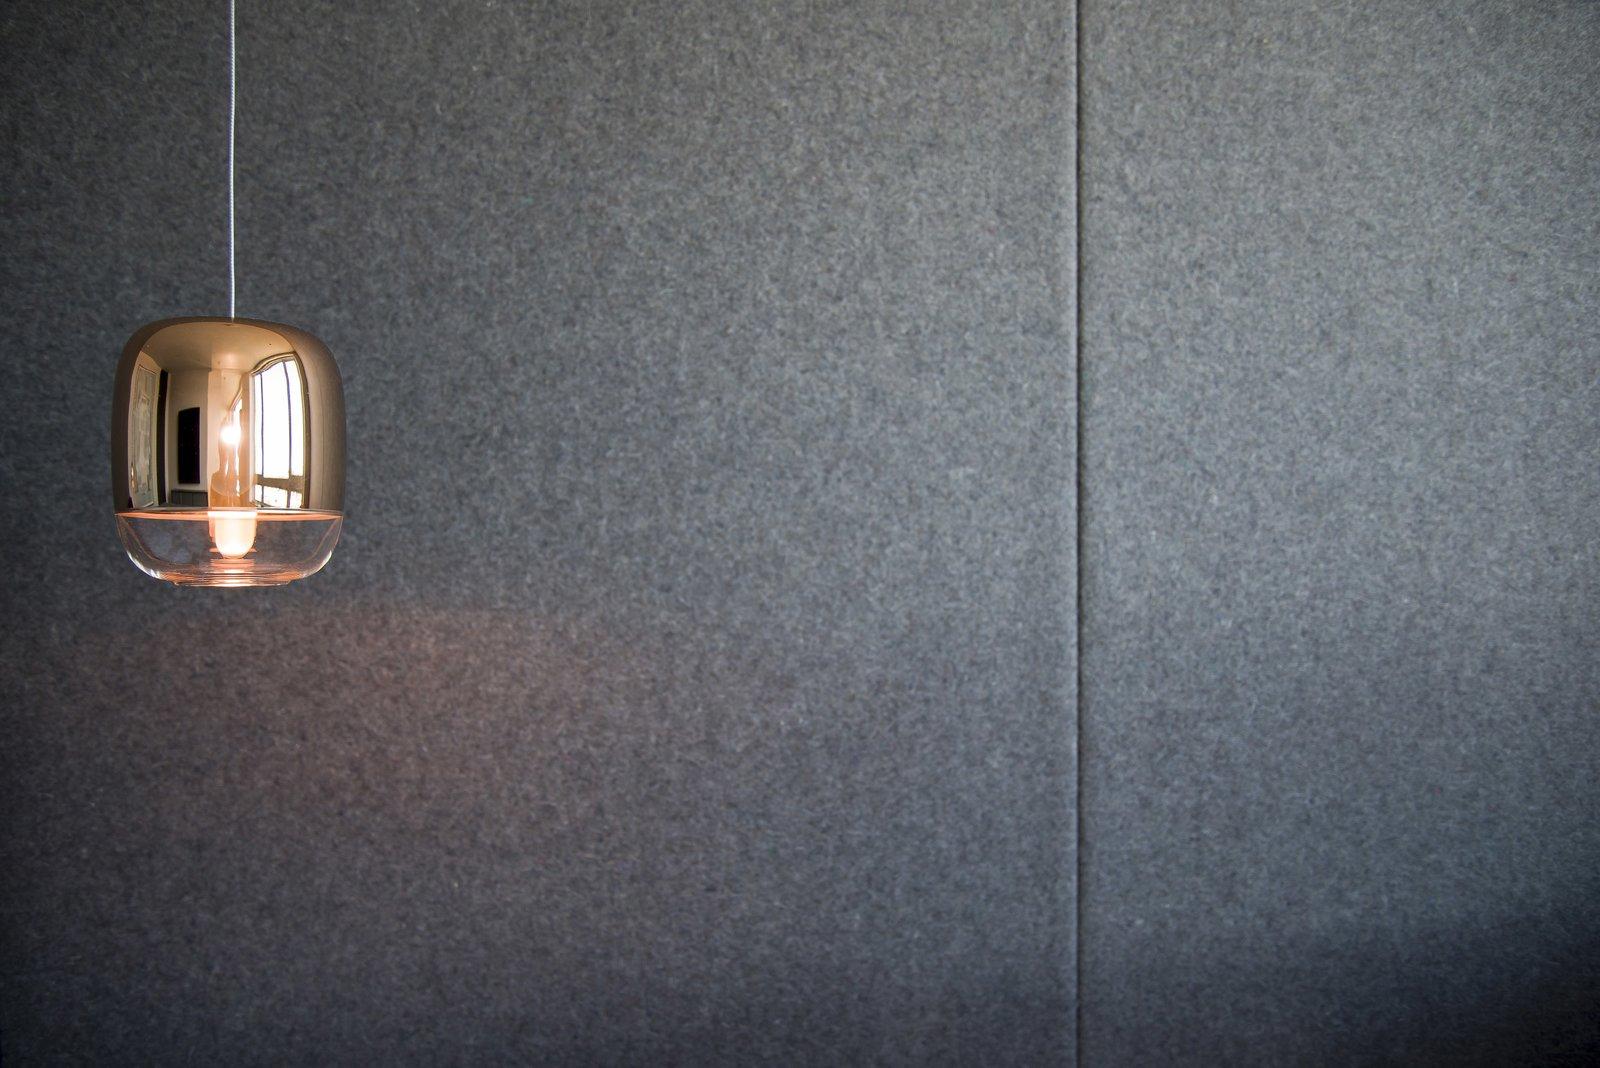 Master Bedroom - Felt Wall Detail  Nob Hill Residence by Imbue Design